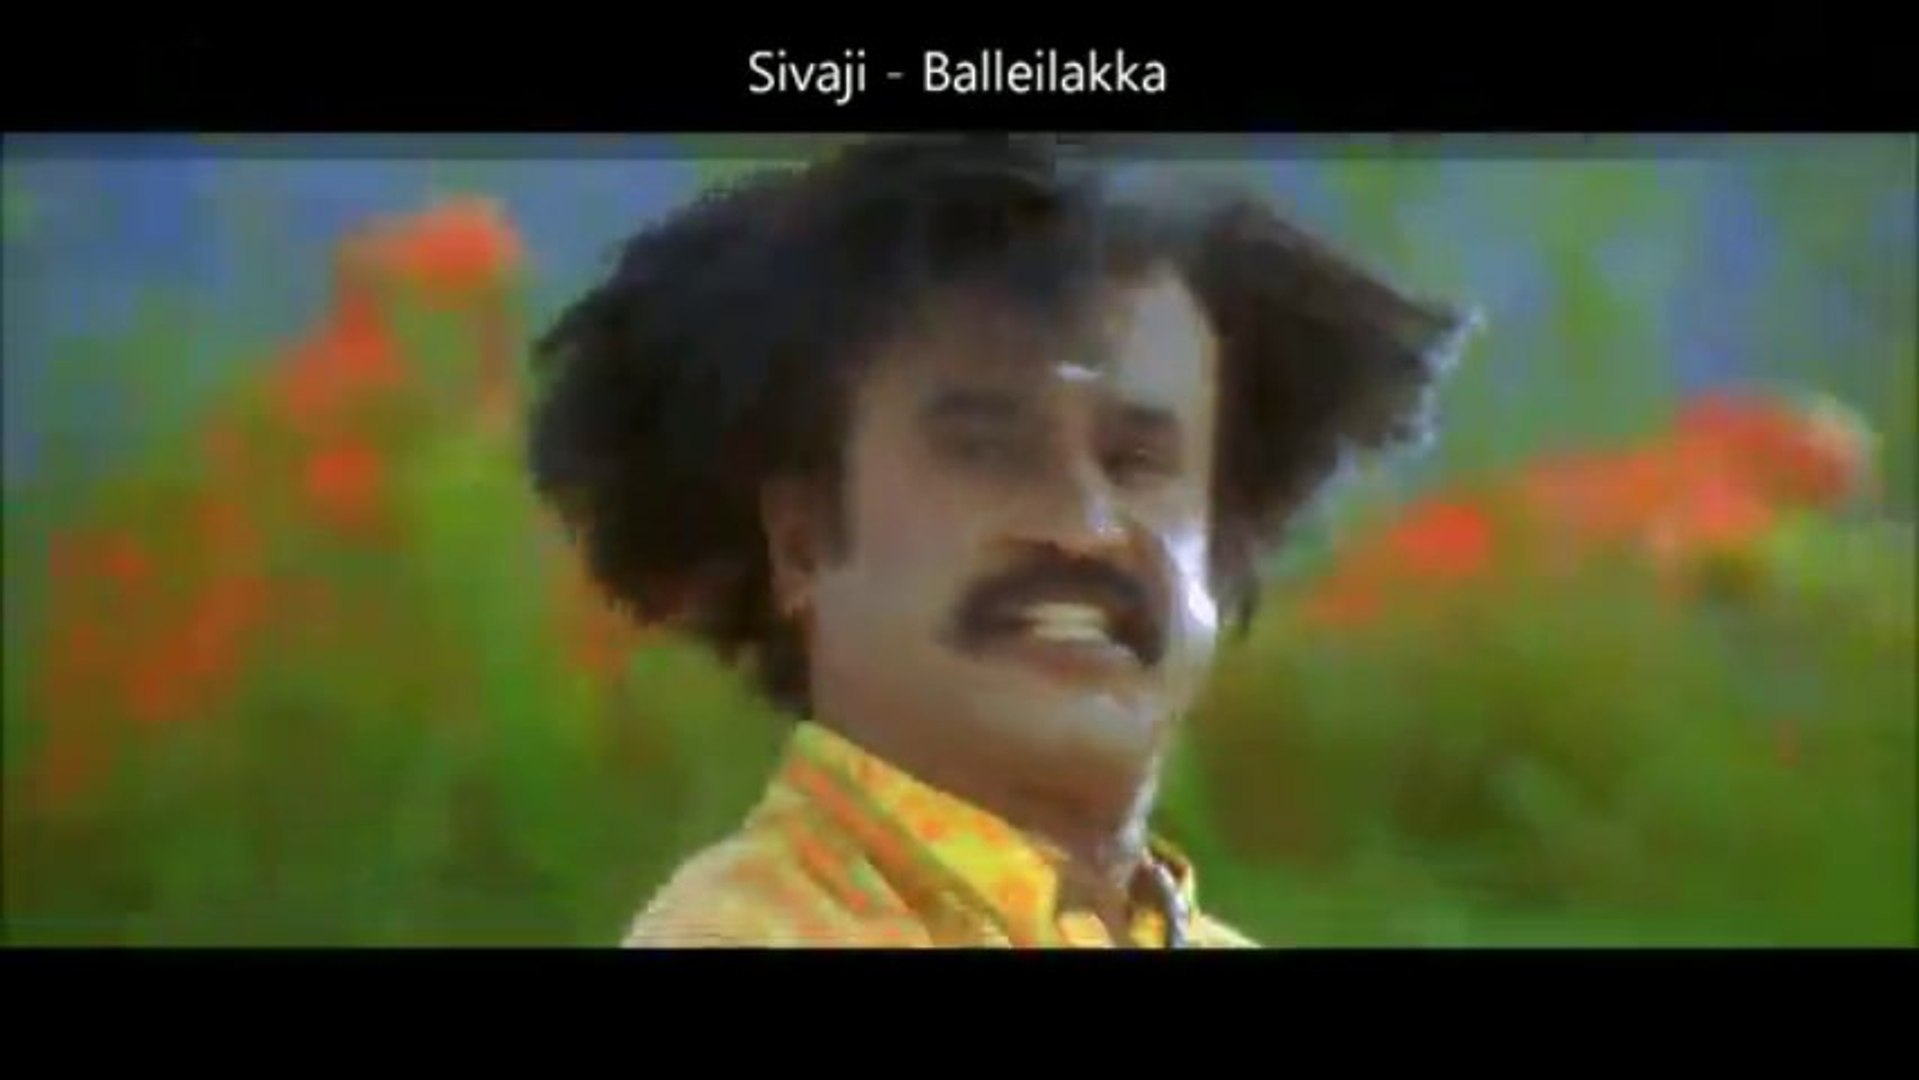 Sivaji - Balleilakka Tamil Video Song